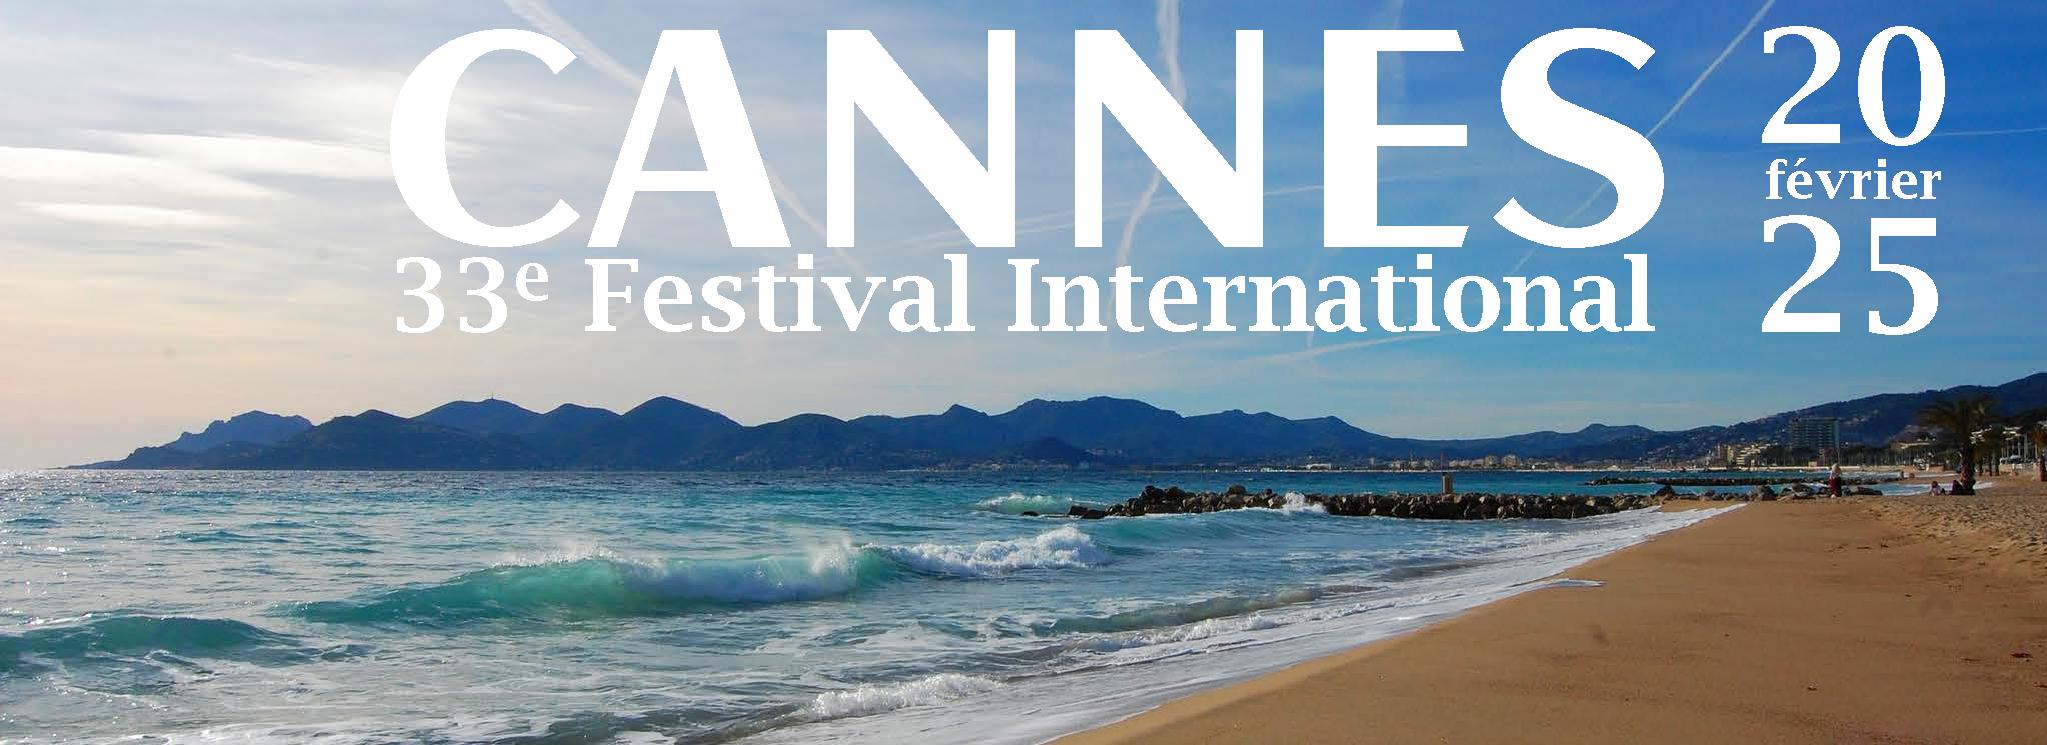 33e Festival de Cannes